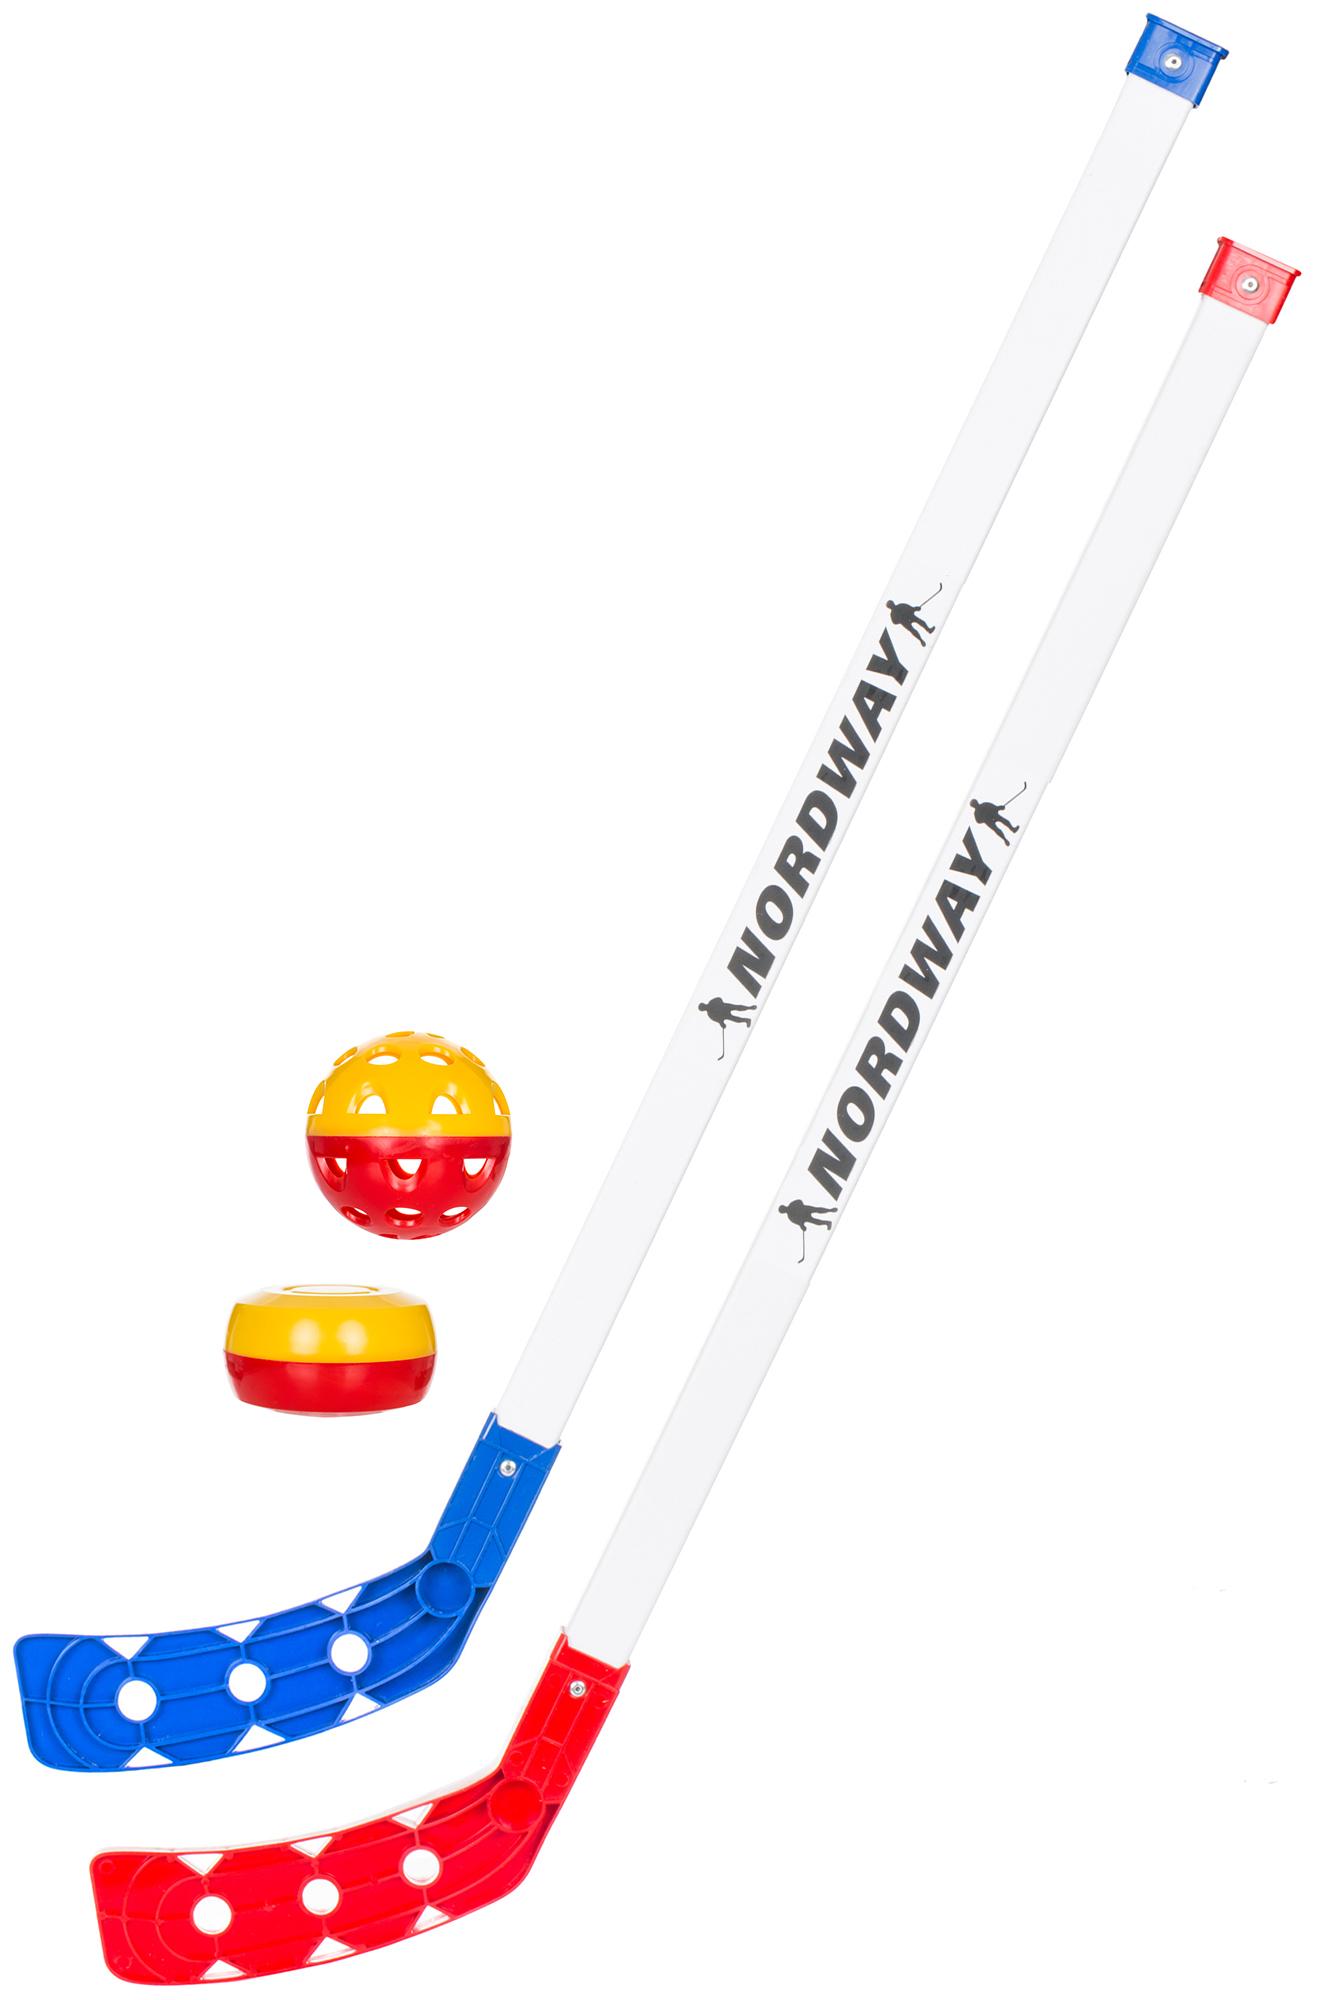 Nordway Набор клюшек хоккейных детских Nordway nordway крепления для лыж nordway nn 75